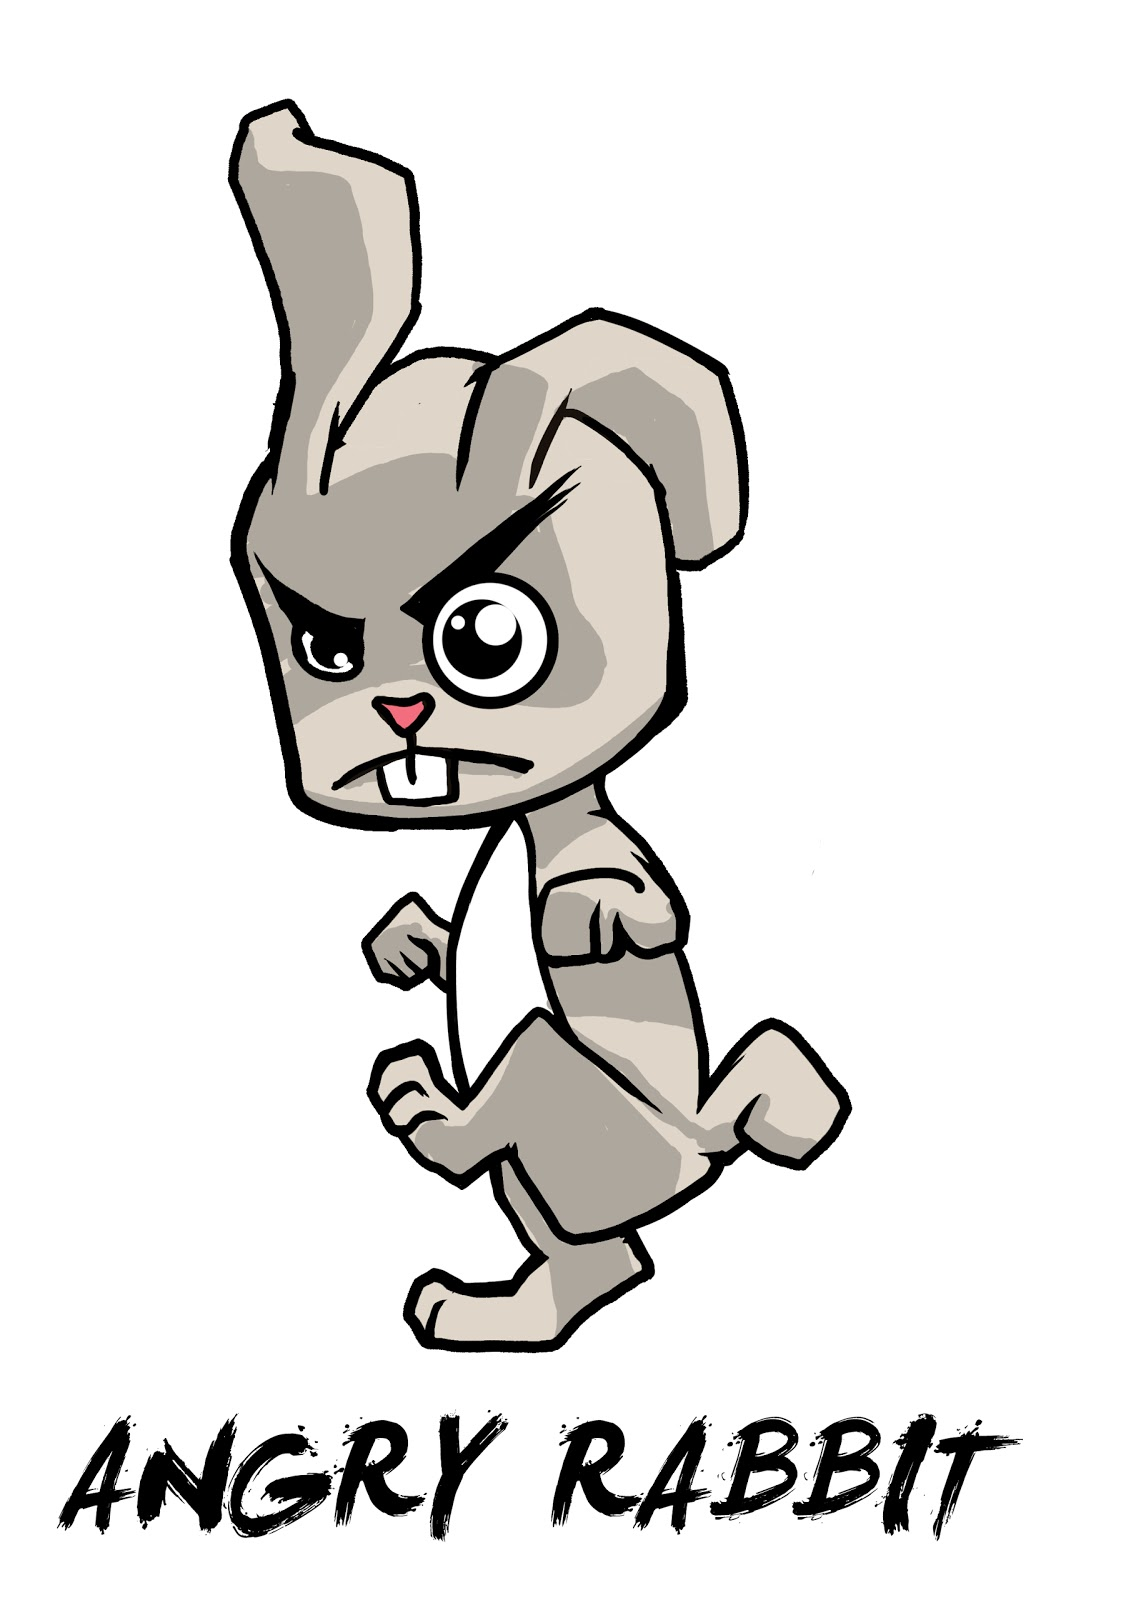 Love Angry Rabbit